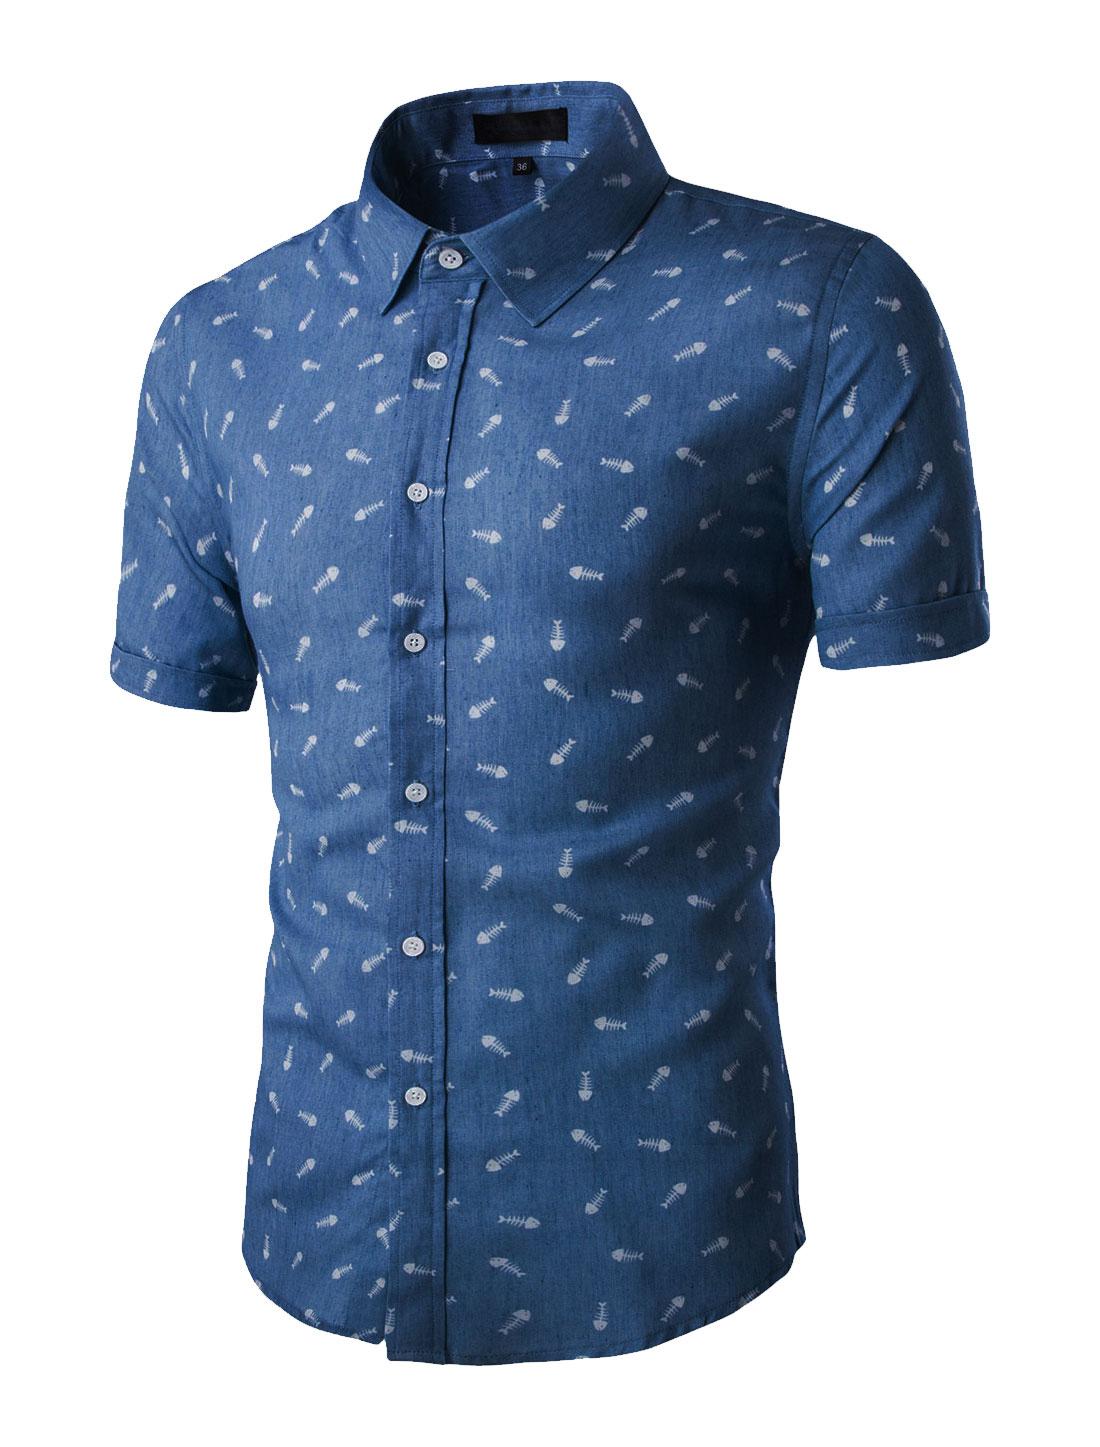 Men's Short Sleeve Button Down Floral Printed Shirt Navy Blue 34